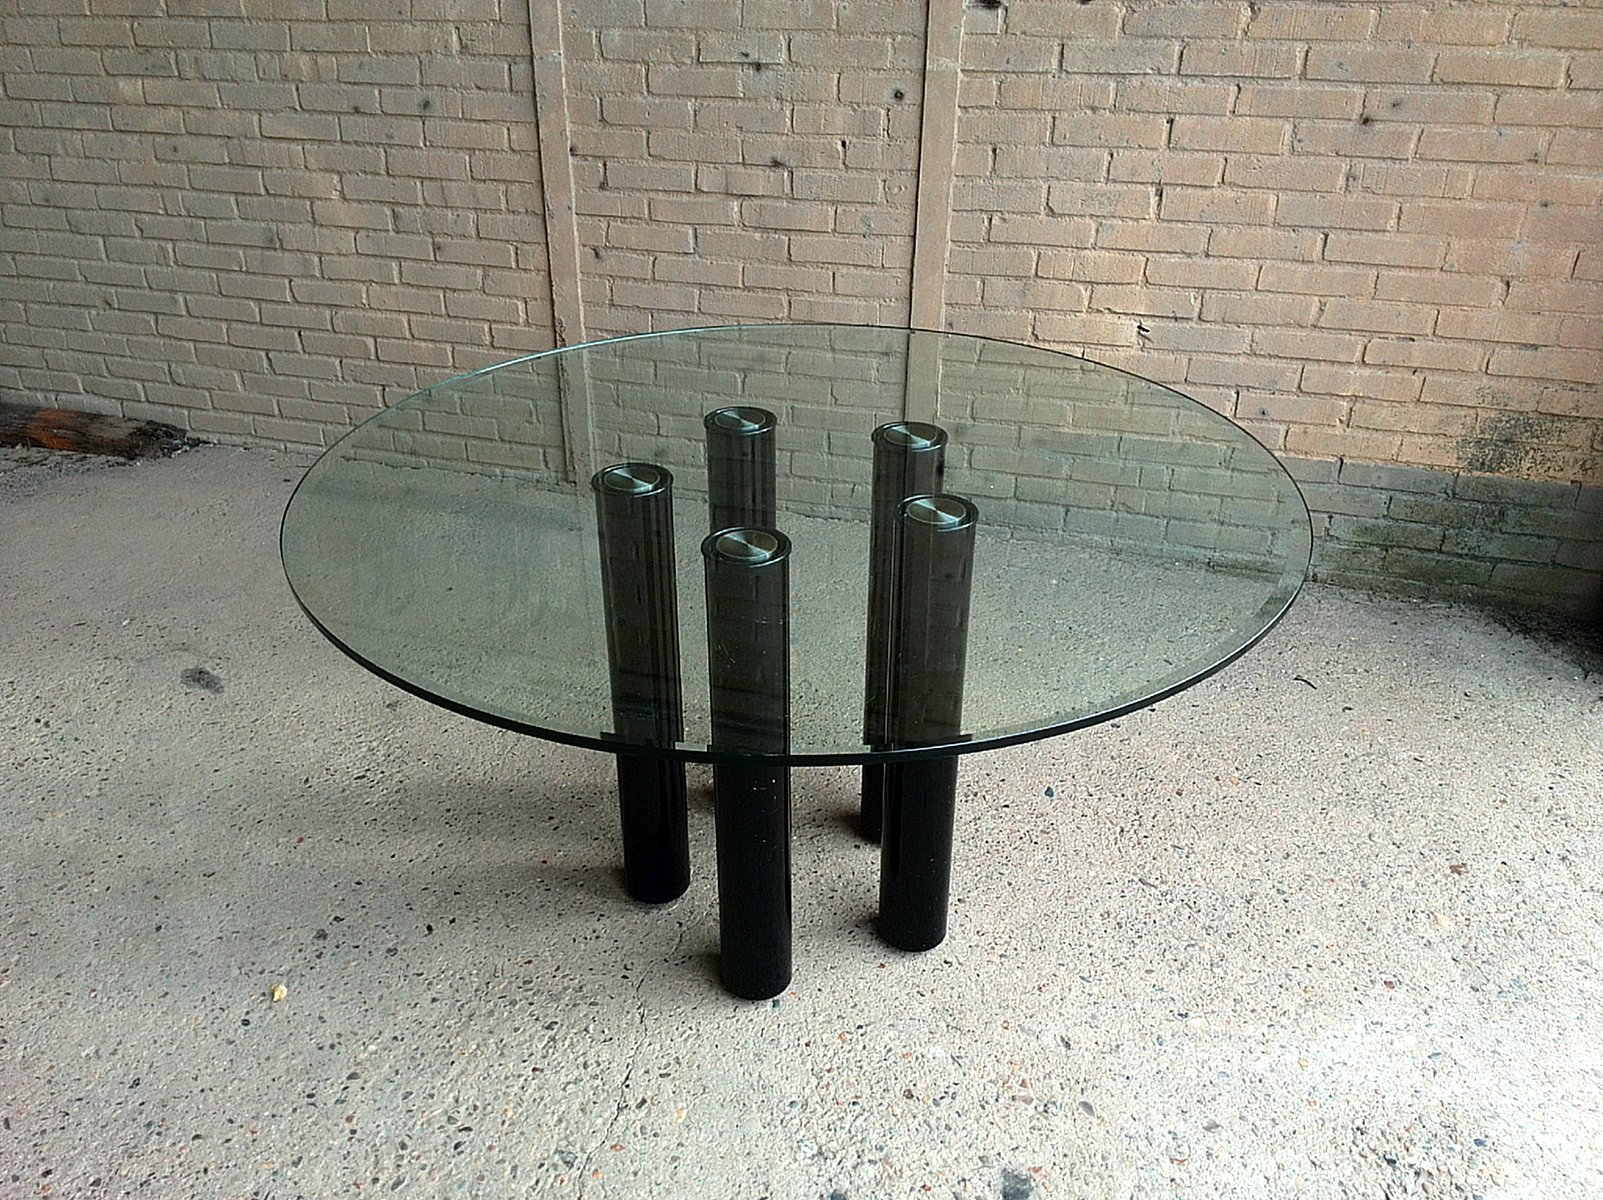 Glass dining table by marco zanuso for zanotta 1979 for sale at pamono glass dining table by marco zanuso for zanotta 1979 keyboard keysfo Images